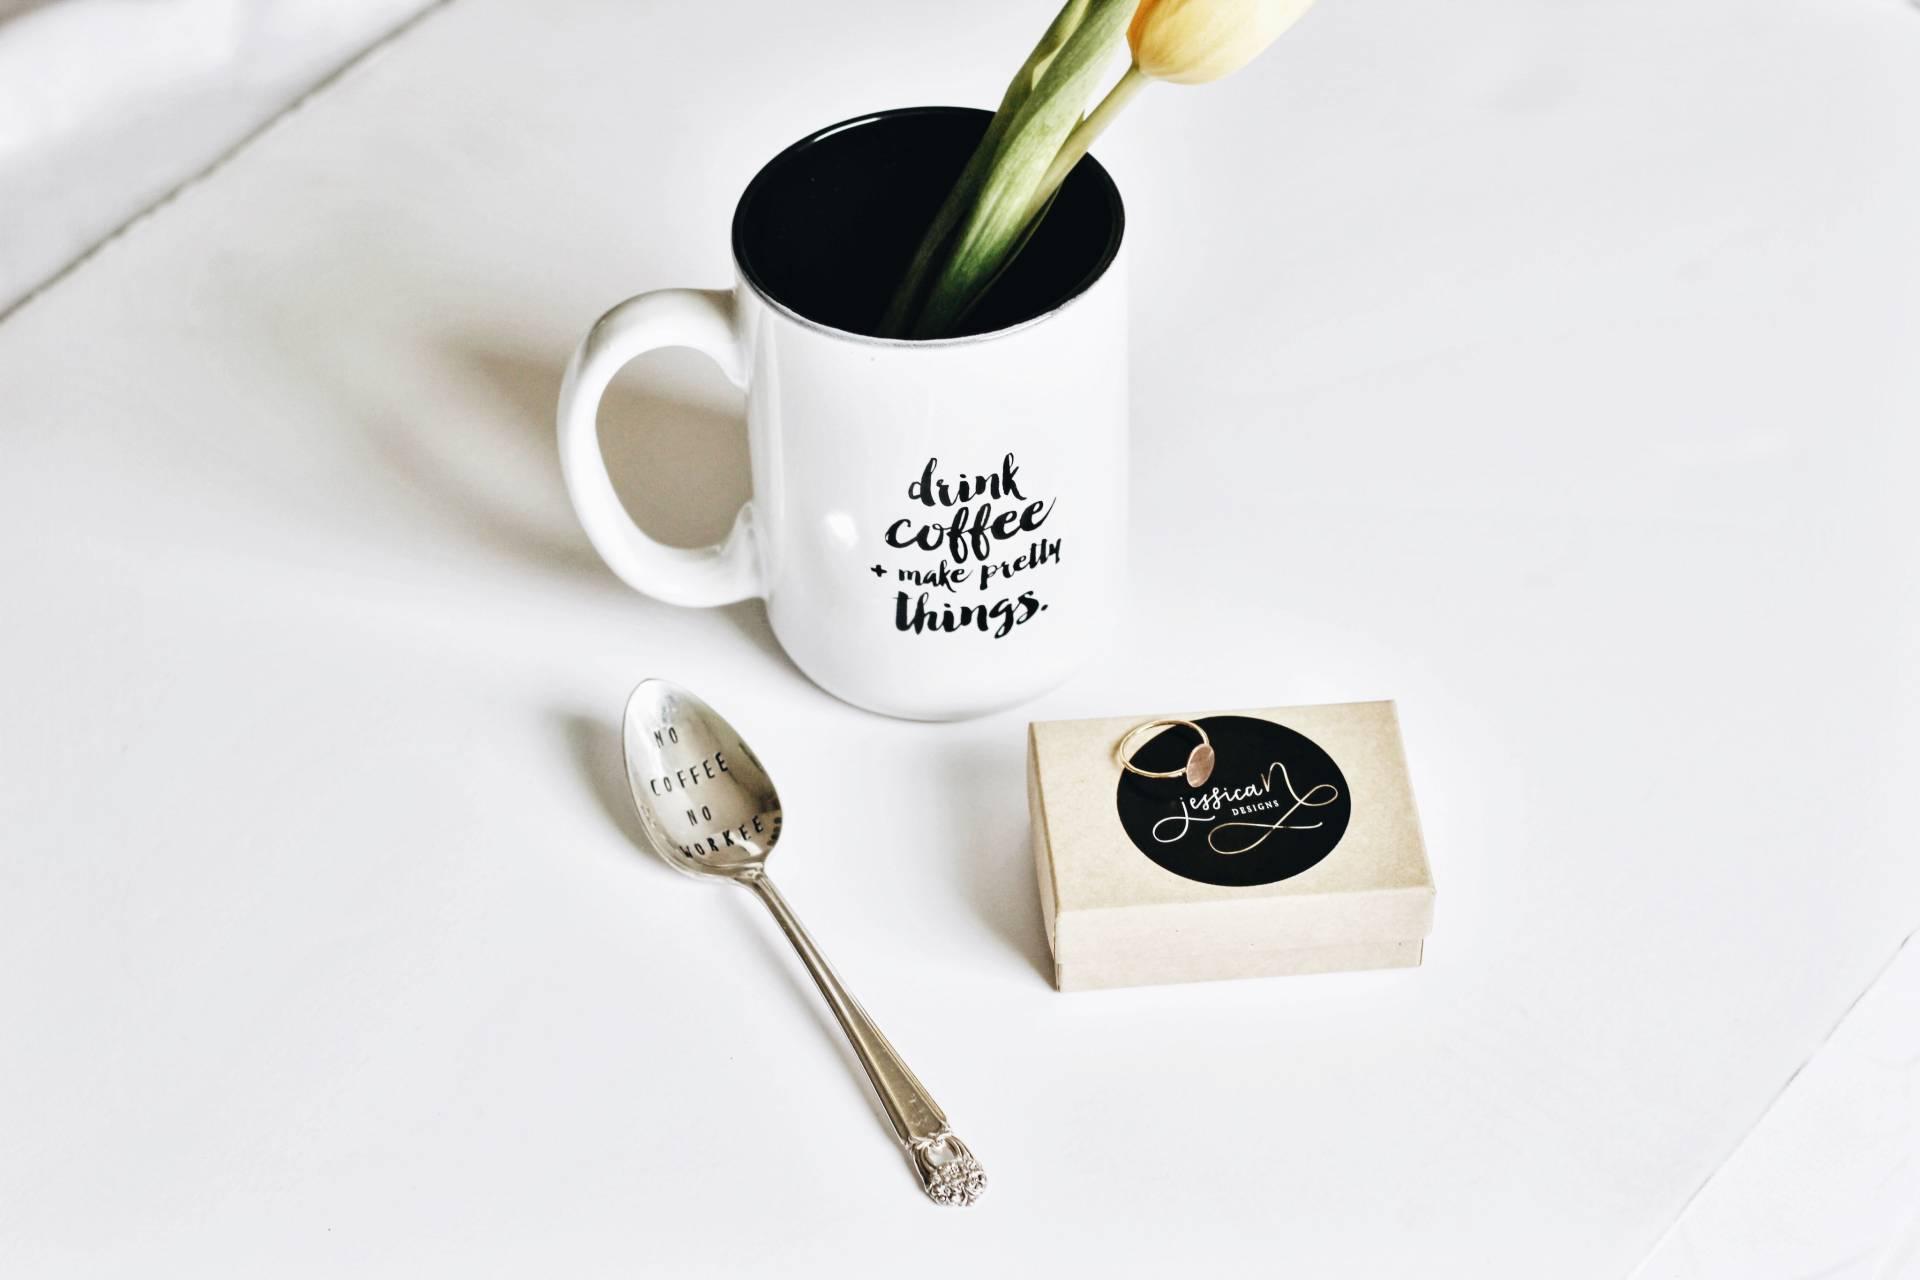 coffee-trinkets- mugs